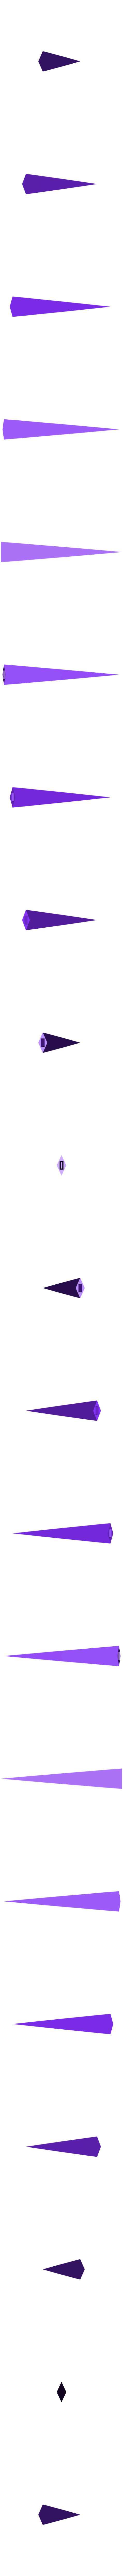 Small_Volume_5.stl Download free STL file V for Vendetta Dagger New and Improved • 3D printer model, stensethjeremy